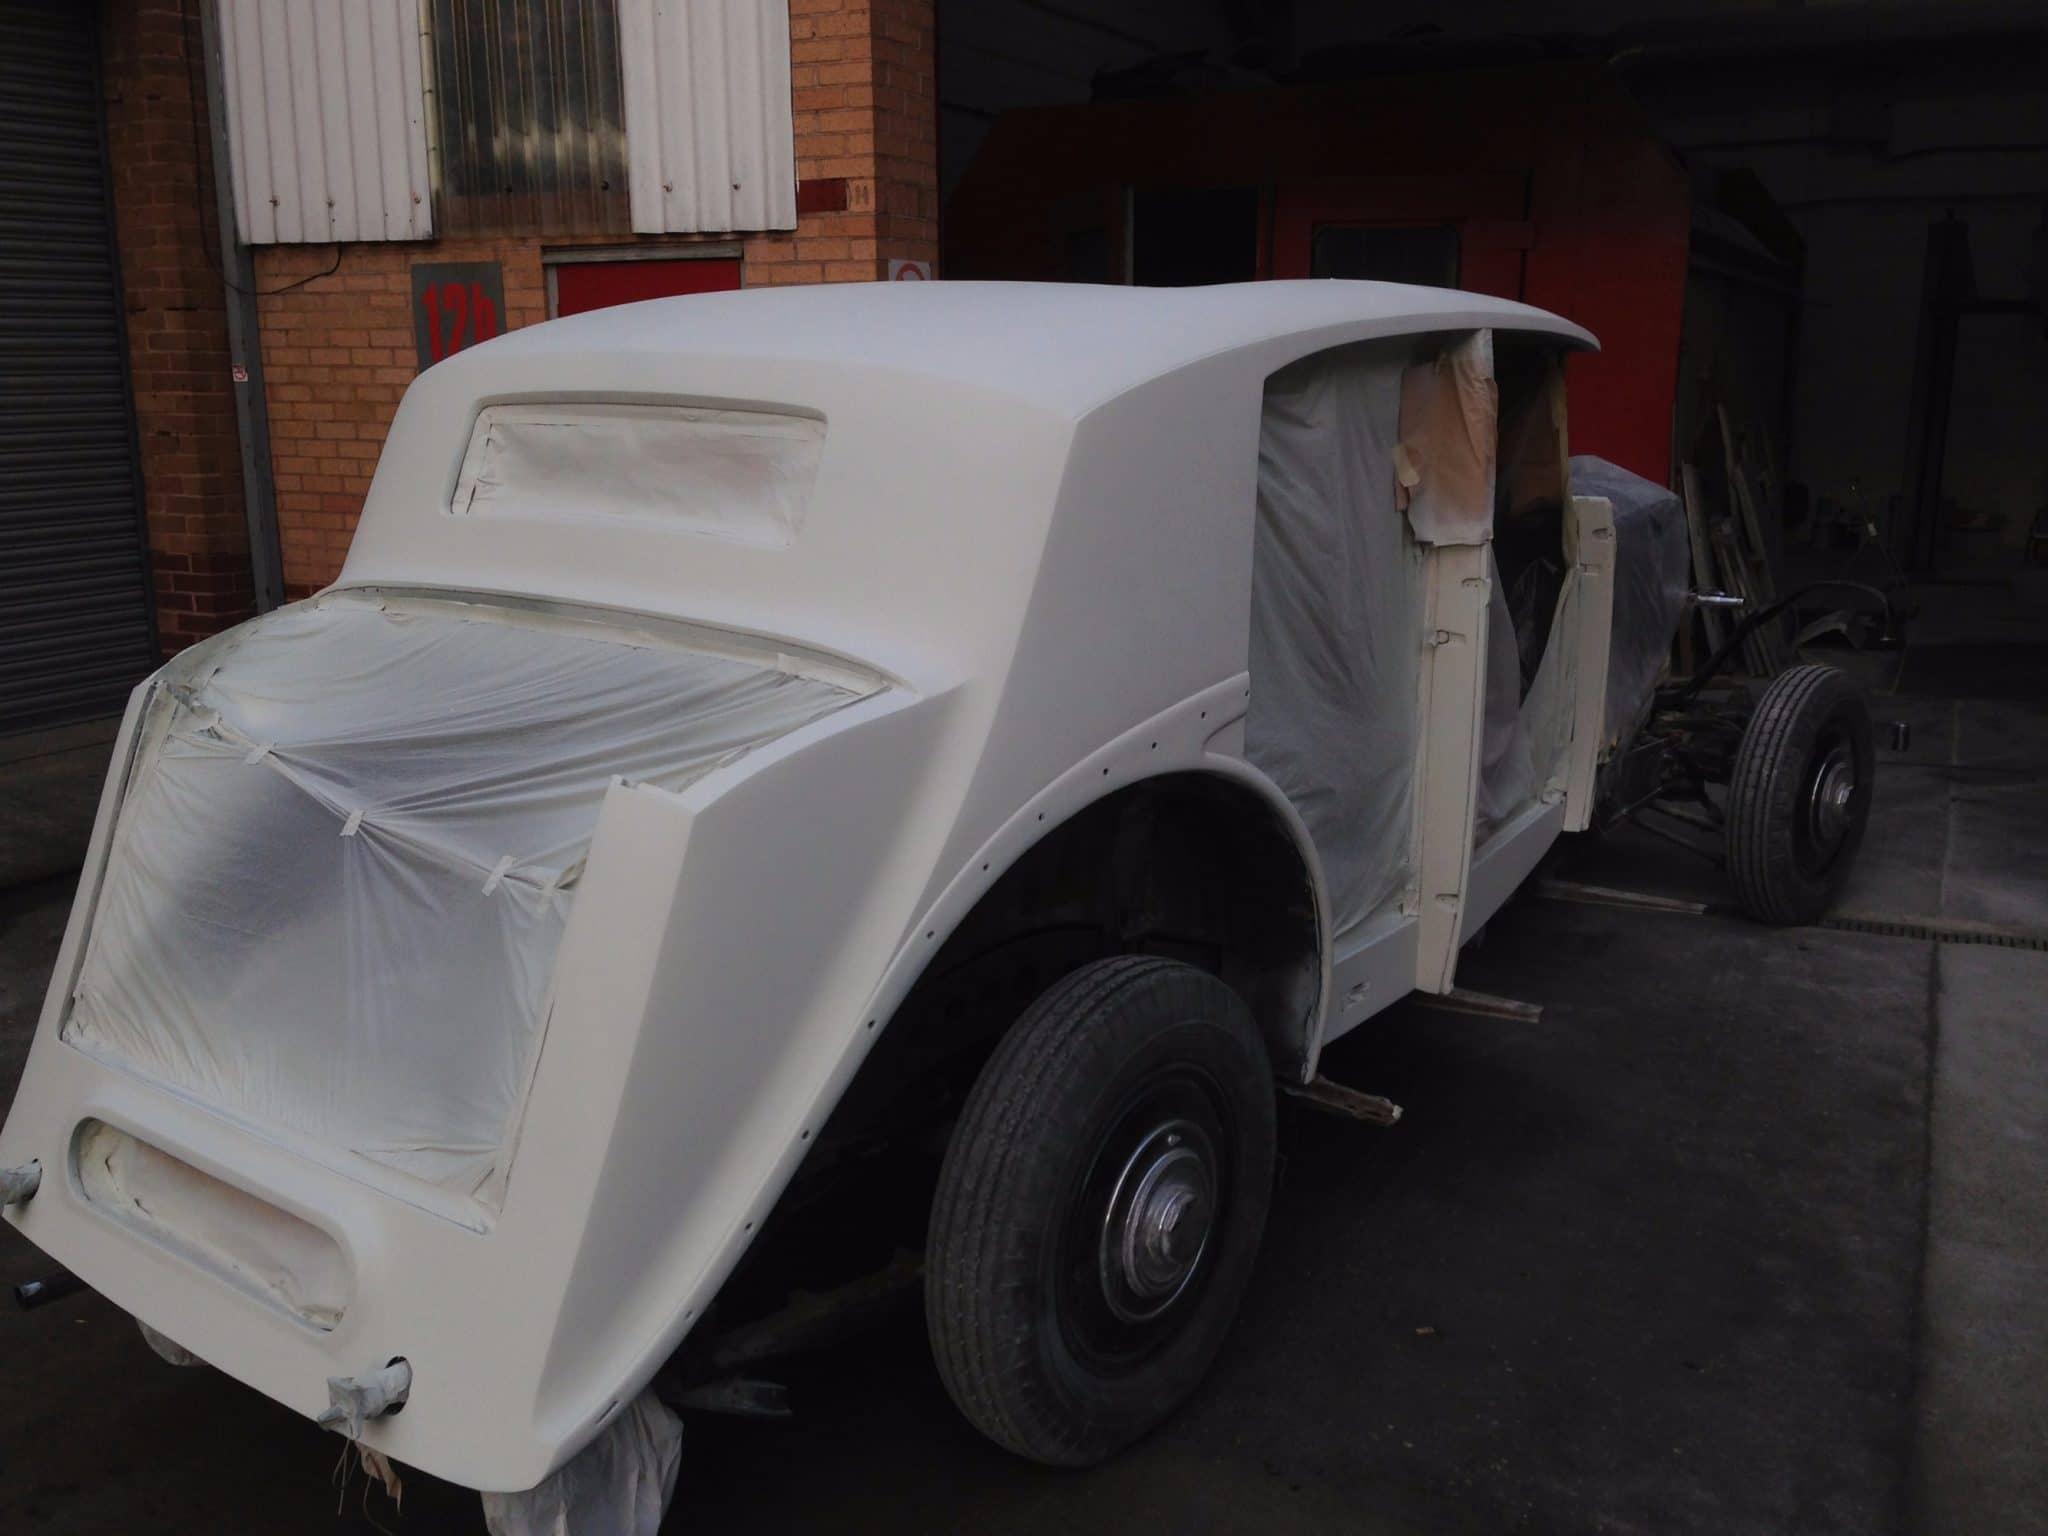 Rolls Royce wraith white undercoat